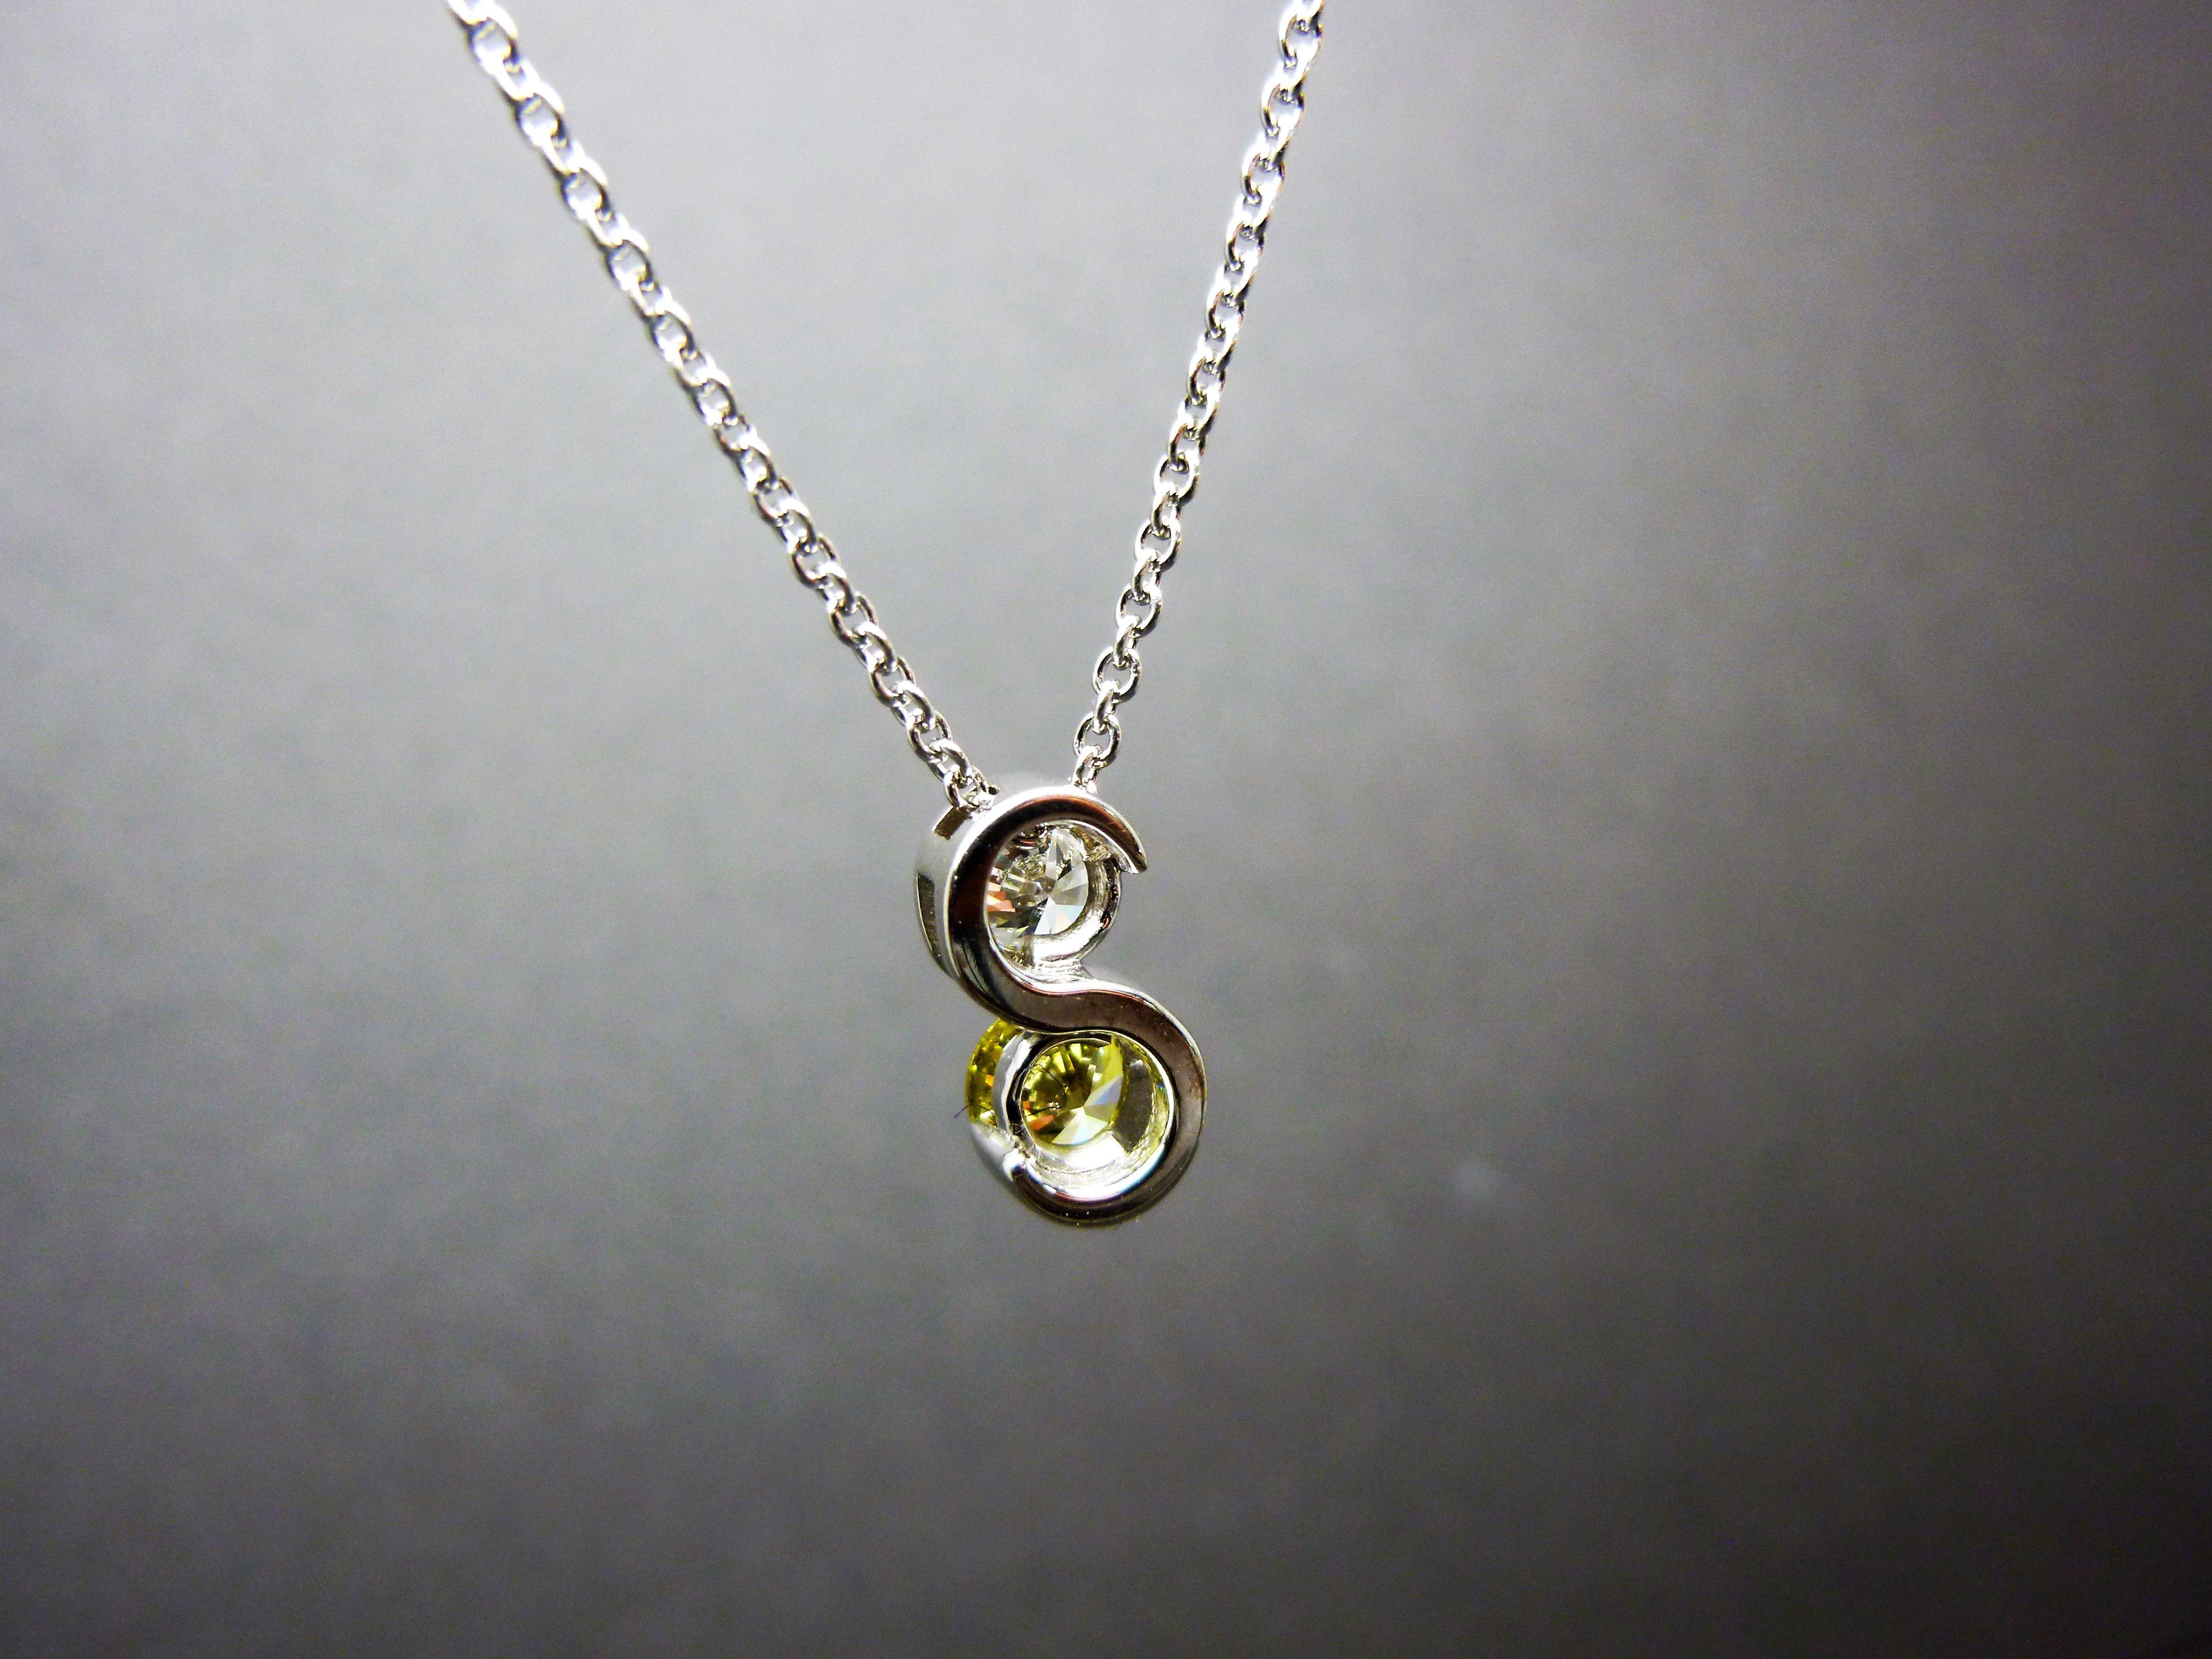 A yellow and white diamond pendant hanging